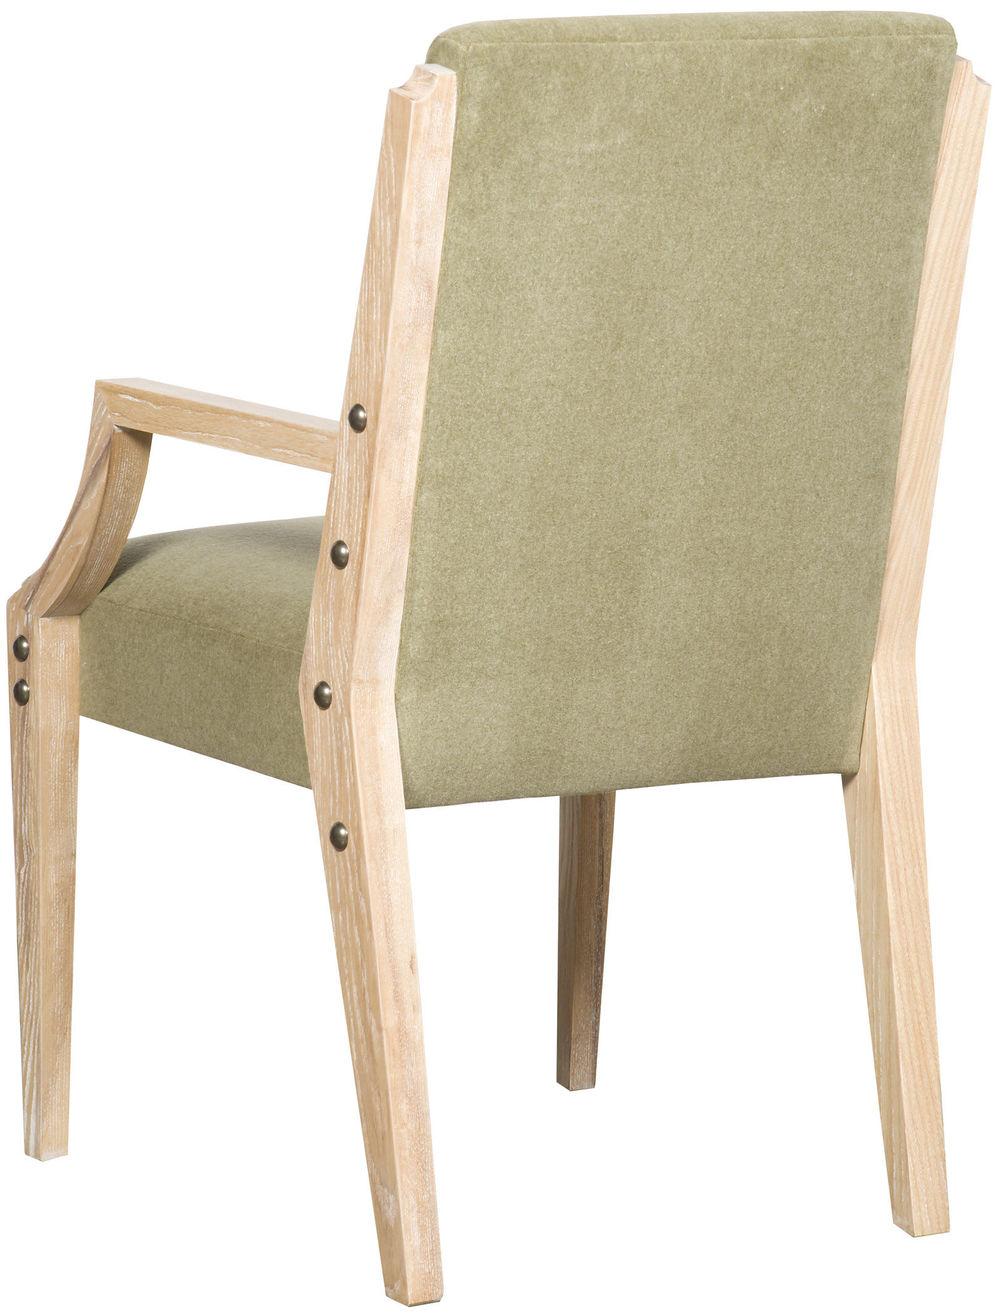 VANGUARD FURNITURE COMPANY - Minoa Arm Chair